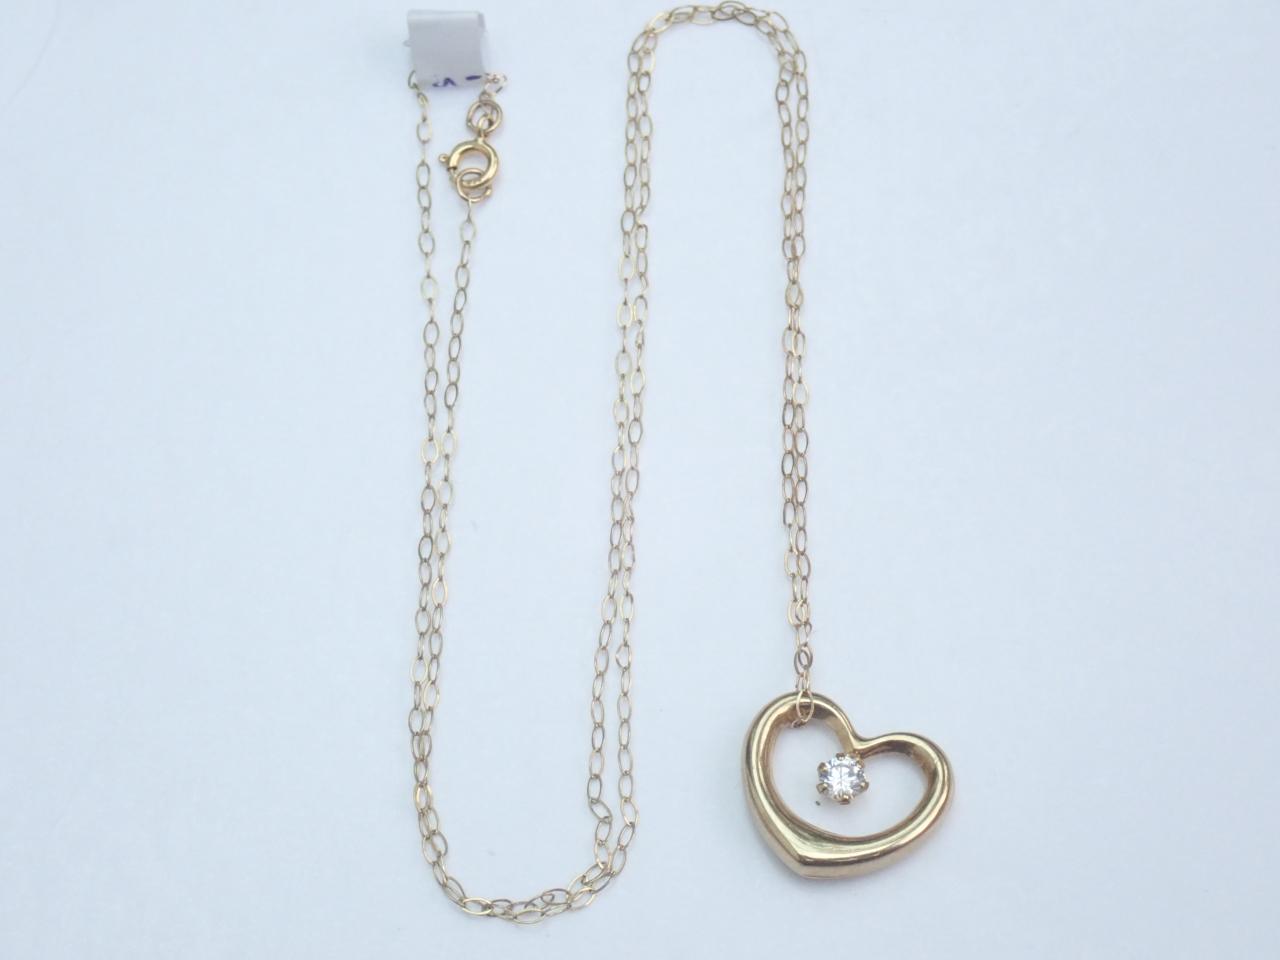 Floating Heart Cubic Zirconia Pendant 375 9k - 16 inch 9k gold Chain